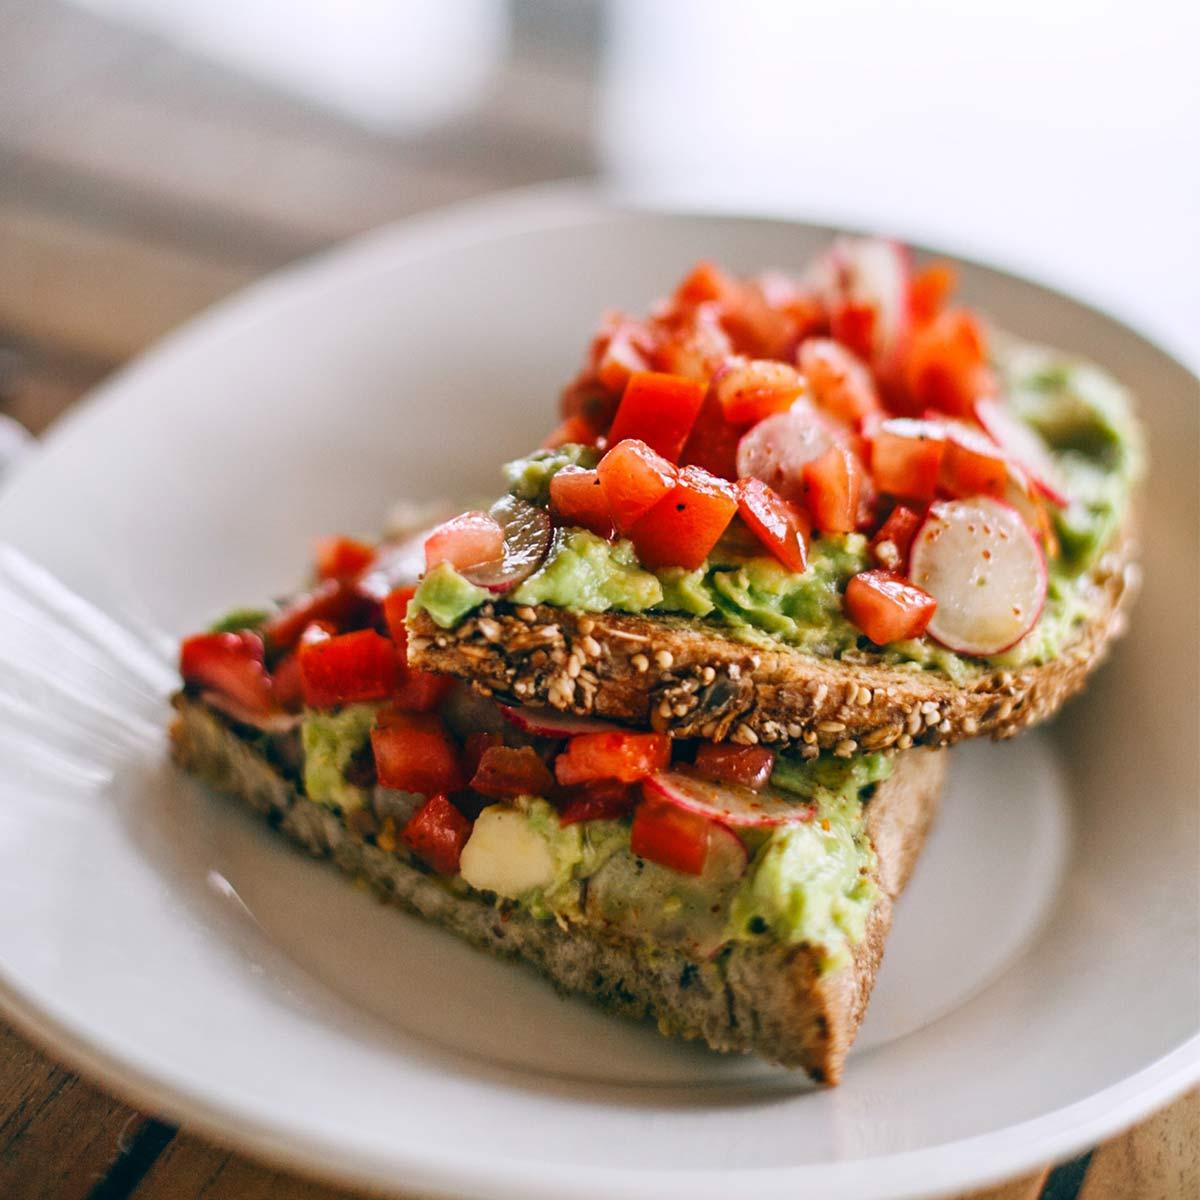 Avocado toast made with vegan bread